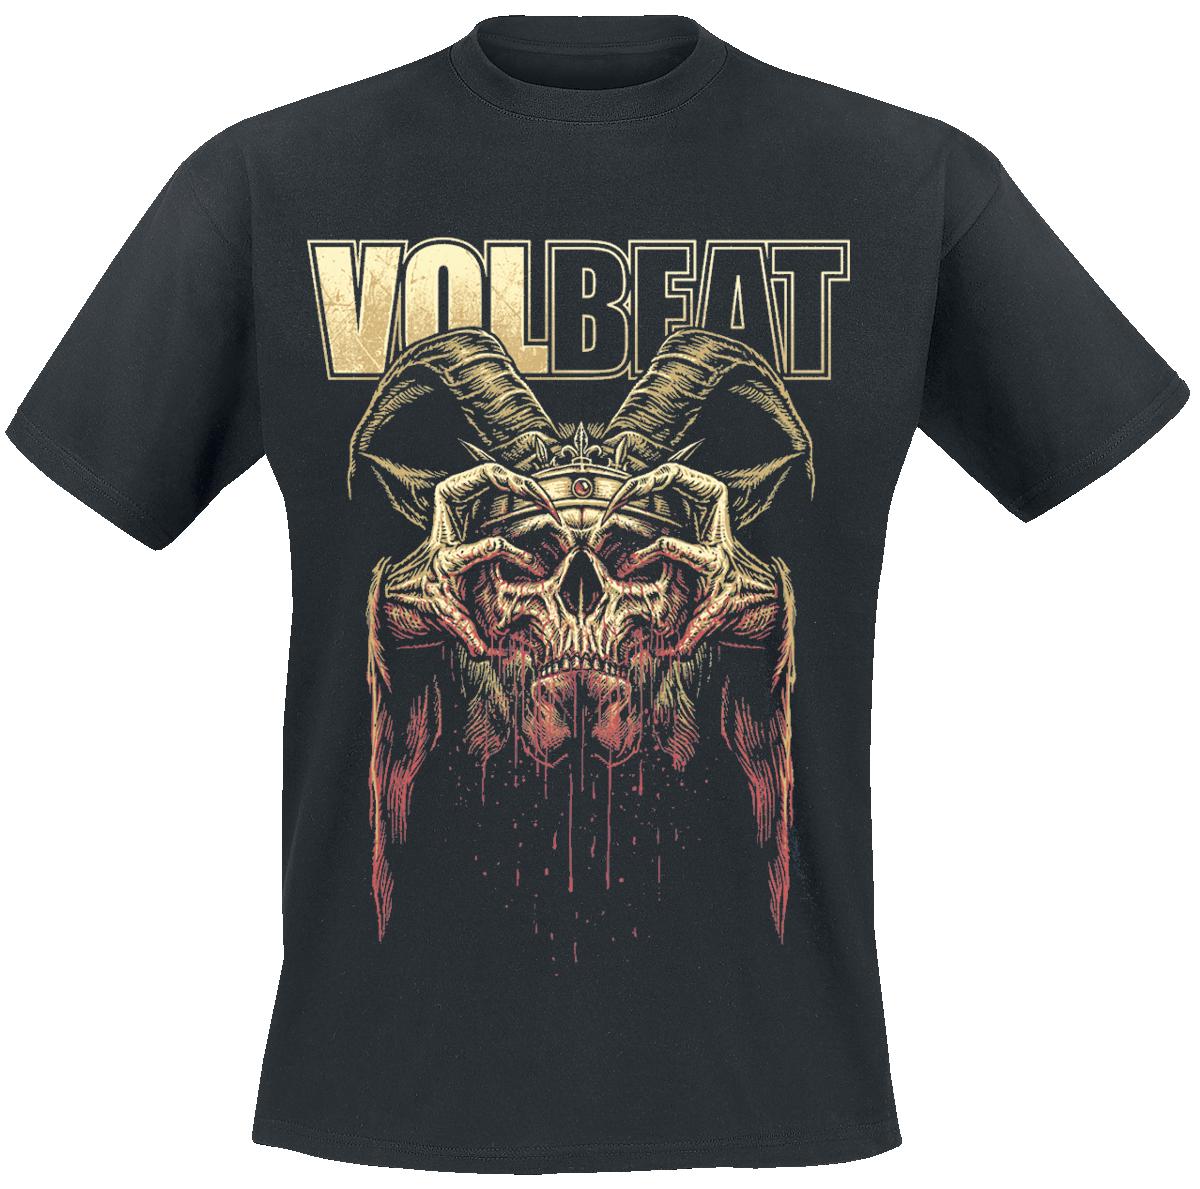 Volbeat - Bleeding Crown Skull - T-Shirt - black image